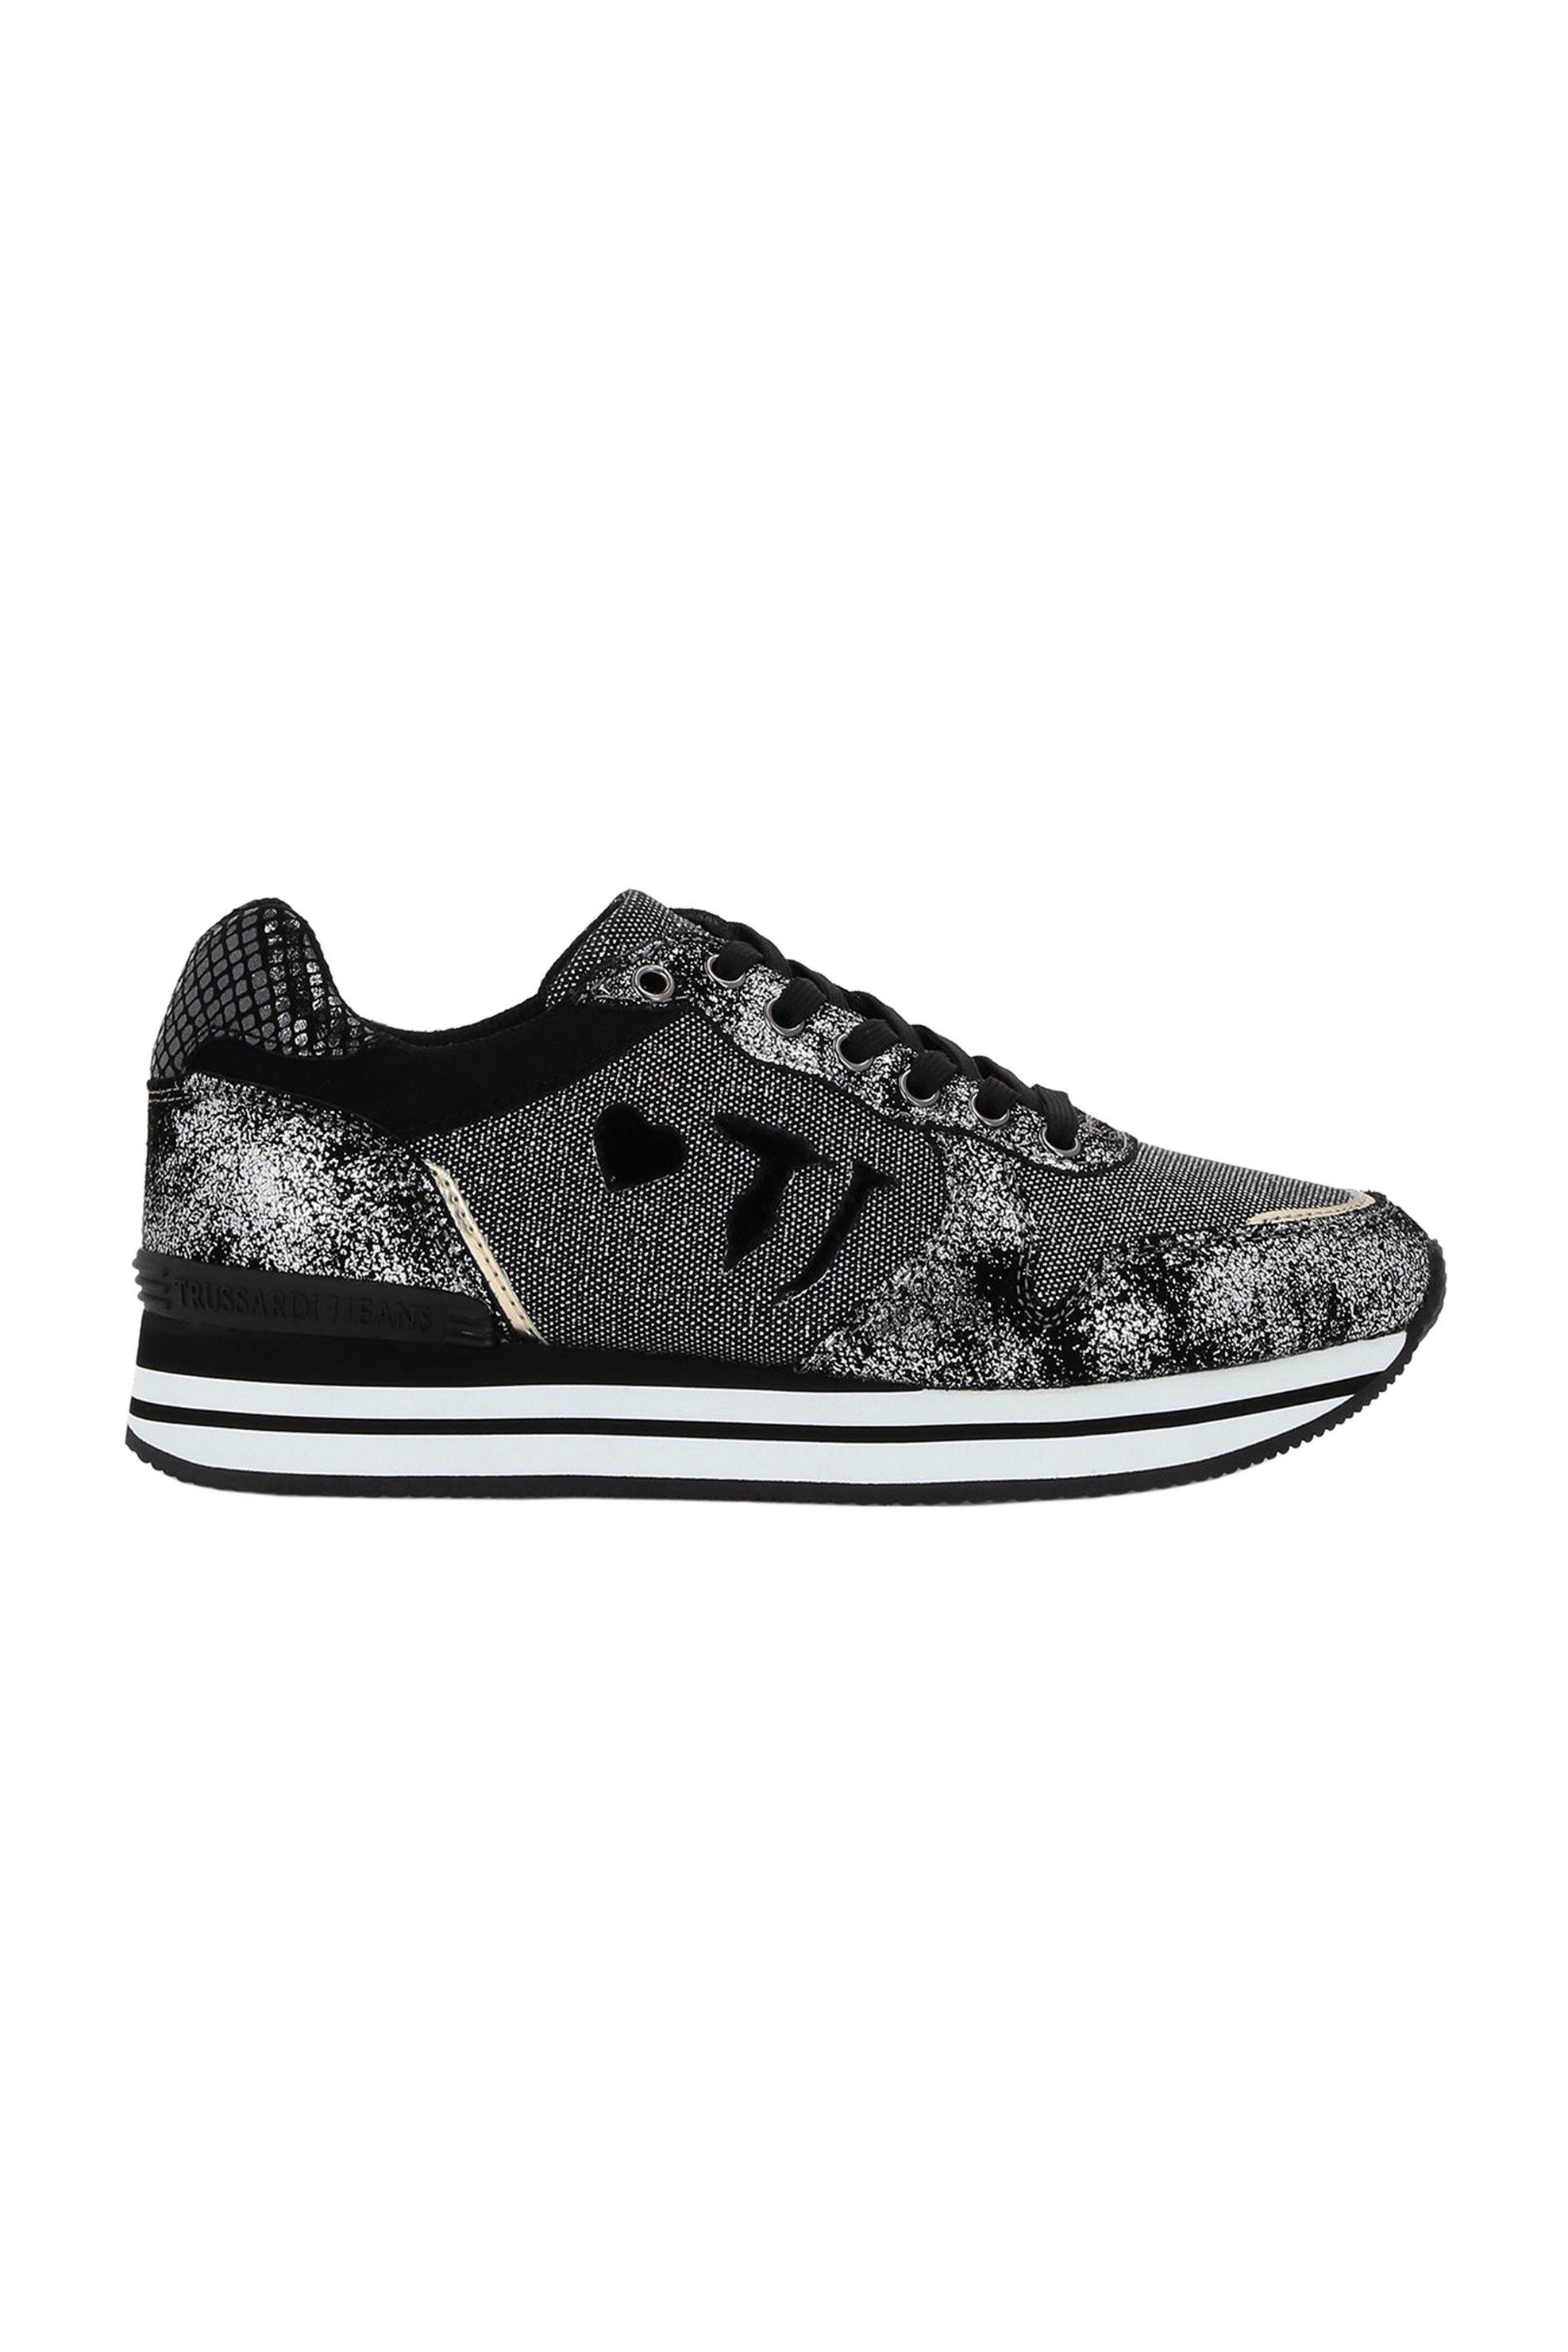 Trussardi γυναικεία sneakers με μεταλλικές λεπτομέρειες – 79A00245-9Y099999 – Μαυρο